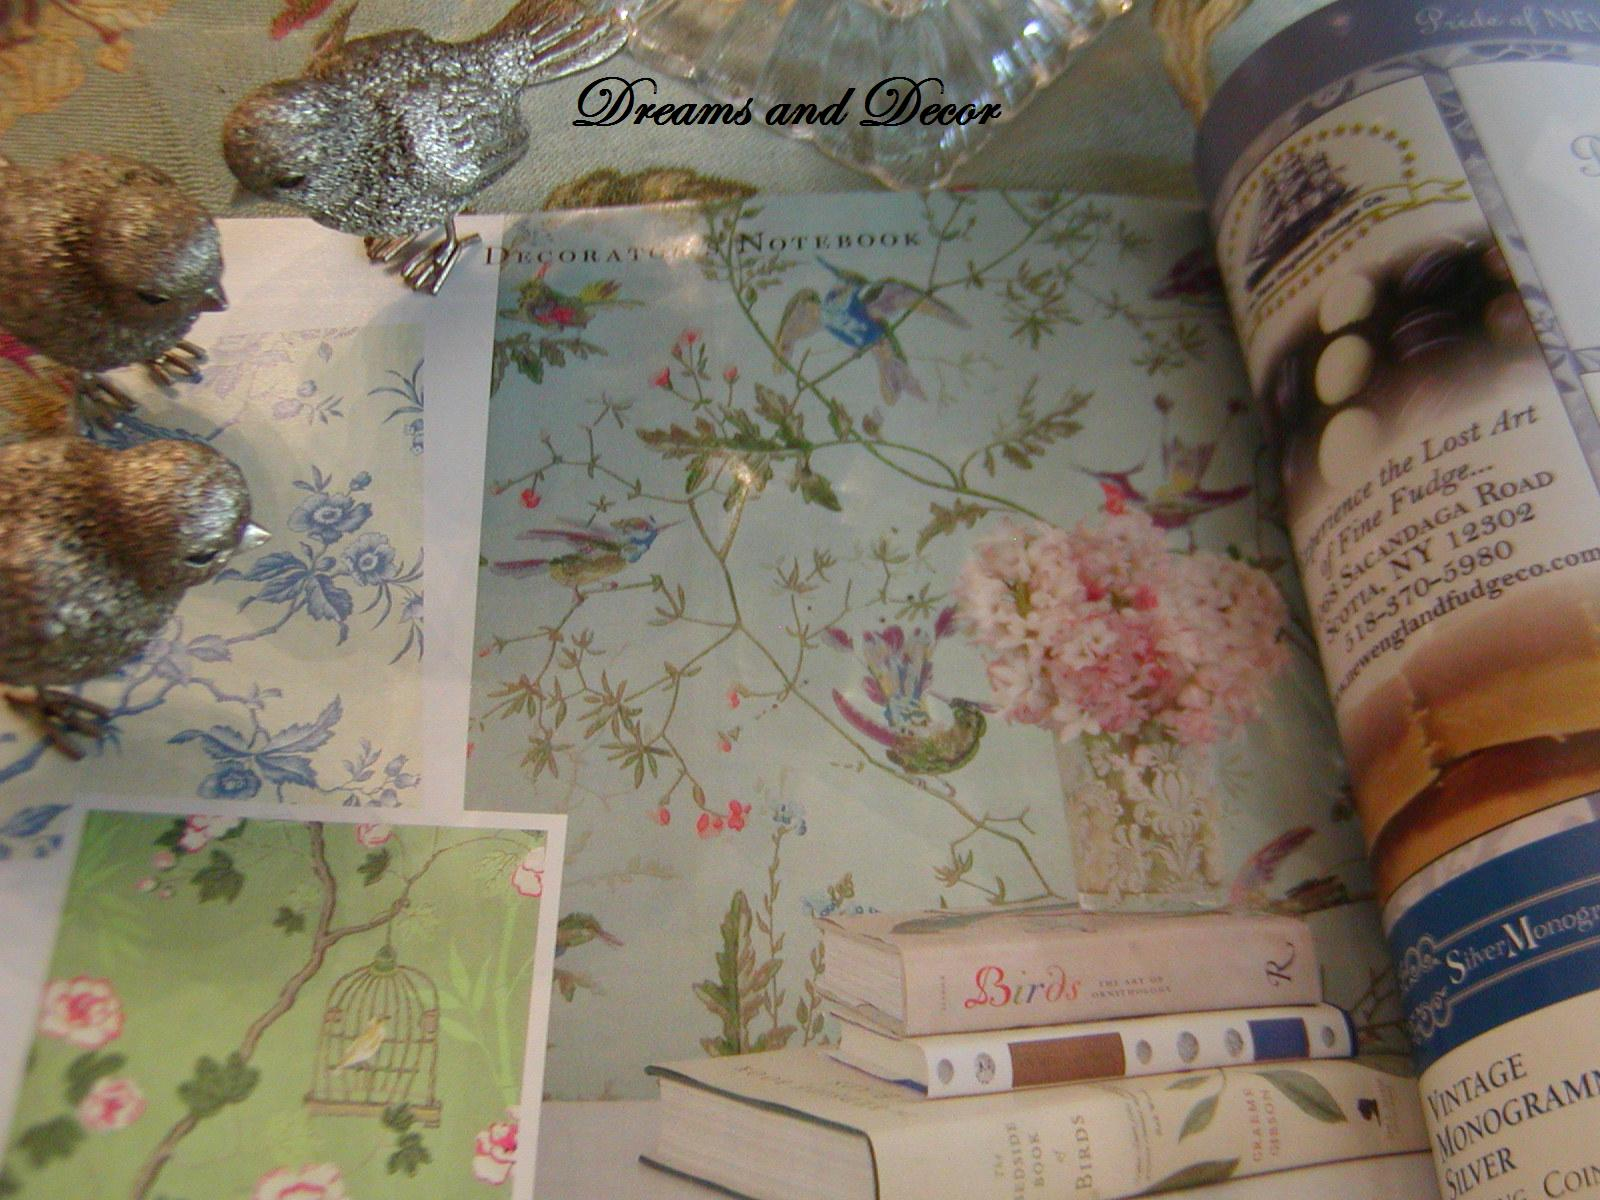 http://4.bp.blogspot.com/_c7ZcmxvDxP0/S_8xK4RbTnI/AAAAAAAABF8/EWyxQ35kig8/s1600/victoria+mag+wallpaper+closeup+wtrmrk.jpg